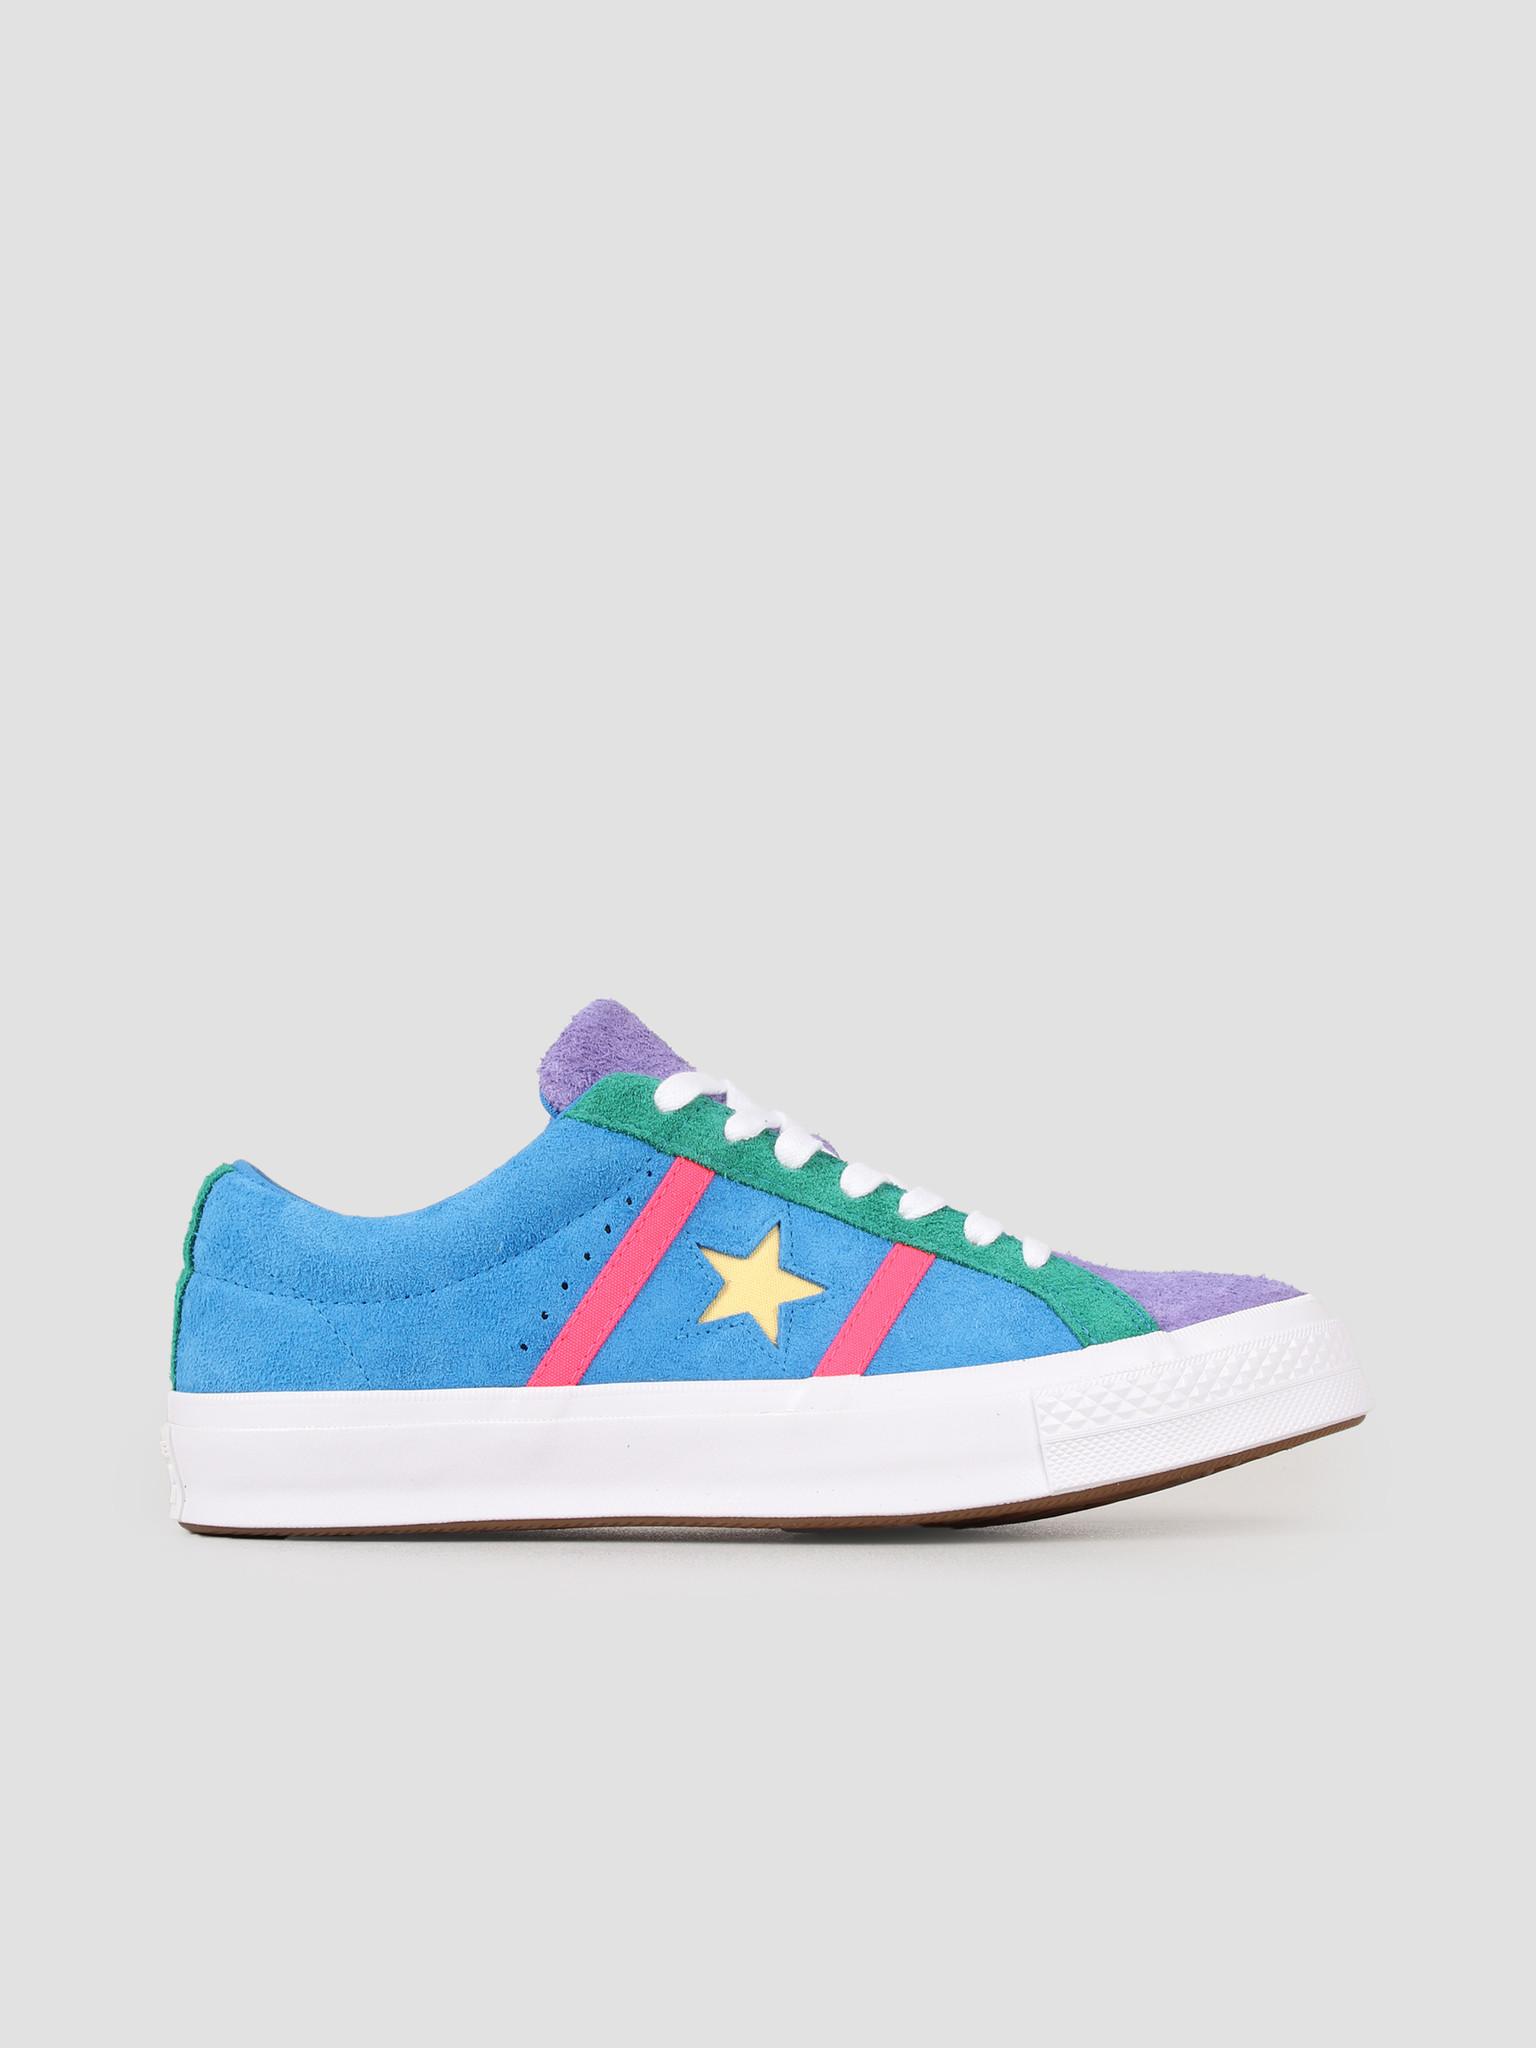 afde56216dba Converse Converse One Star Academy Ox Totally Blue 164392C